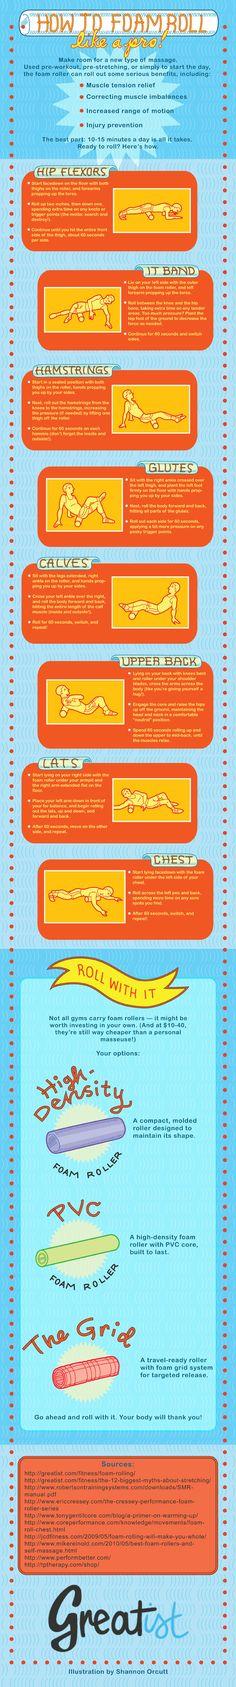 Foam Roller Stretch and Massage